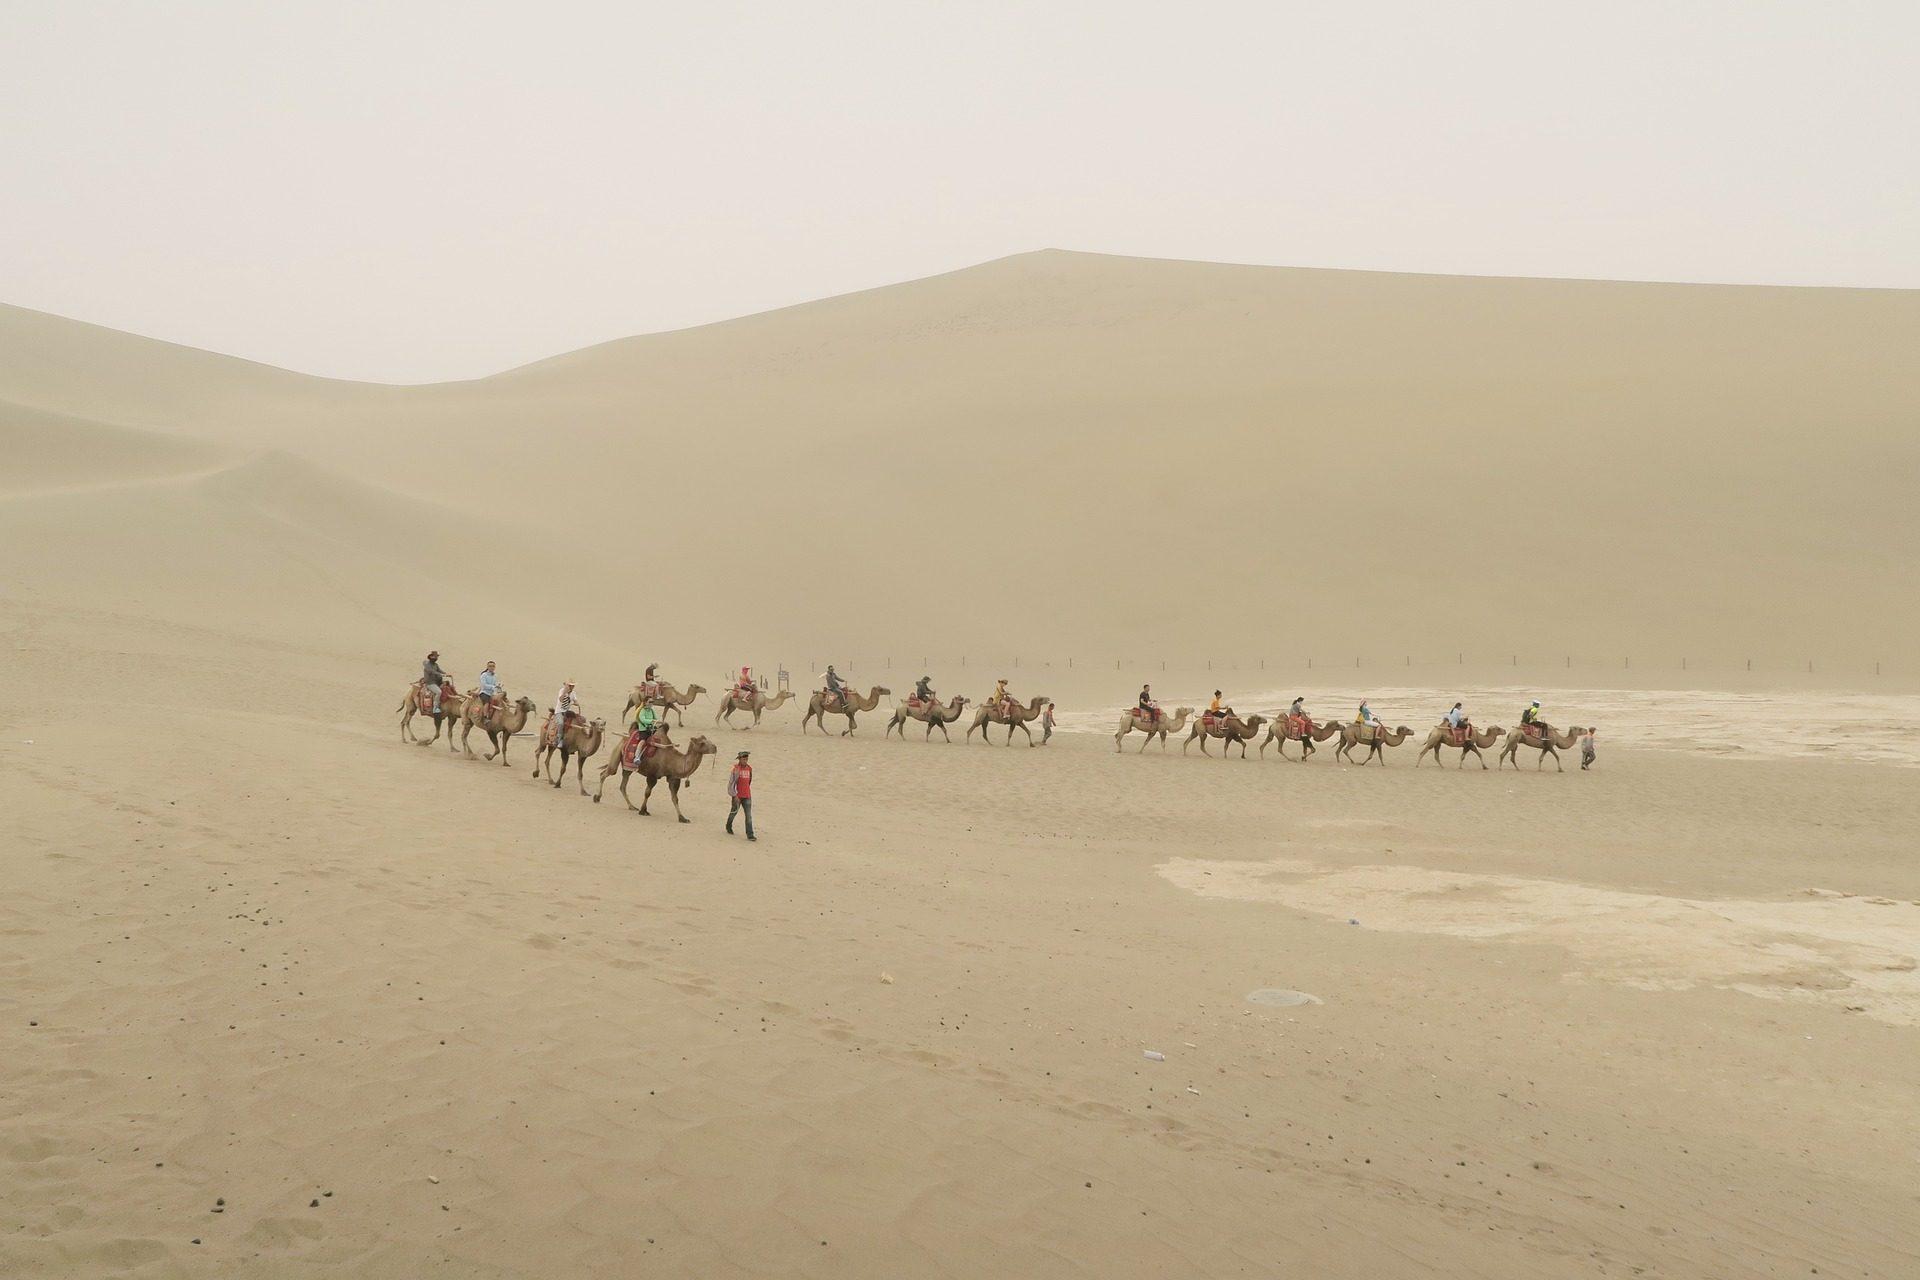 desierto, dunas, arena, camellos, caravana, turismo - Fondos de Pantalla HD - professor-falken.com